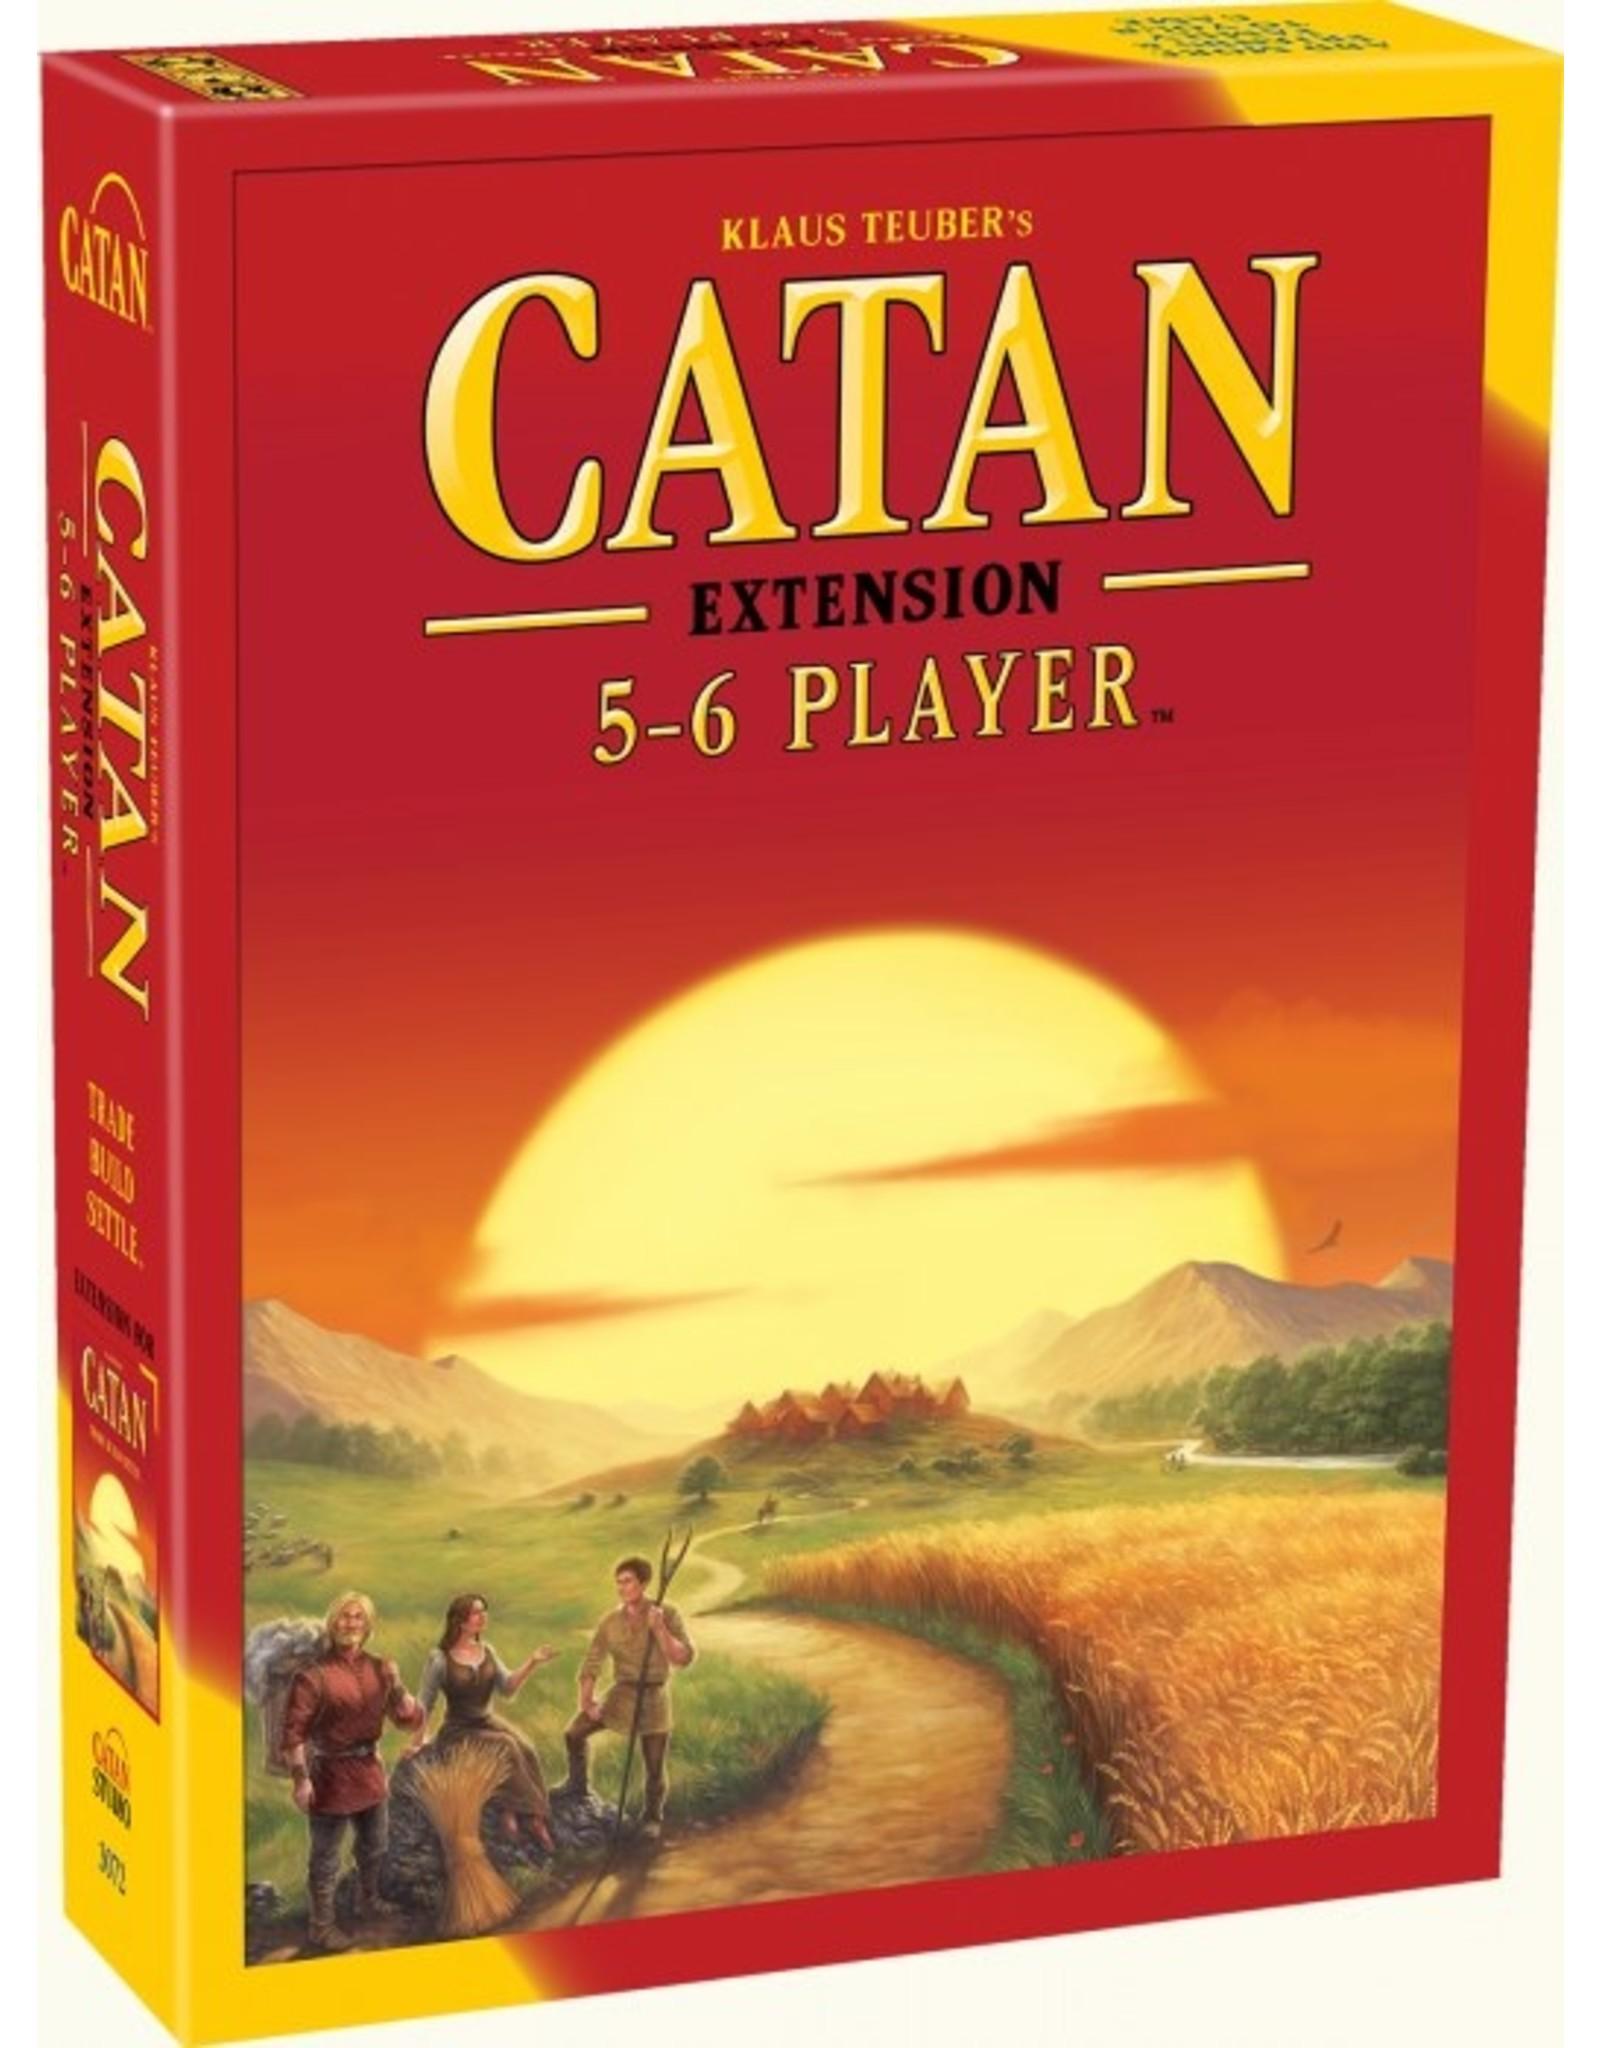 Catan Studio Catan - 5-6 Player Expansion